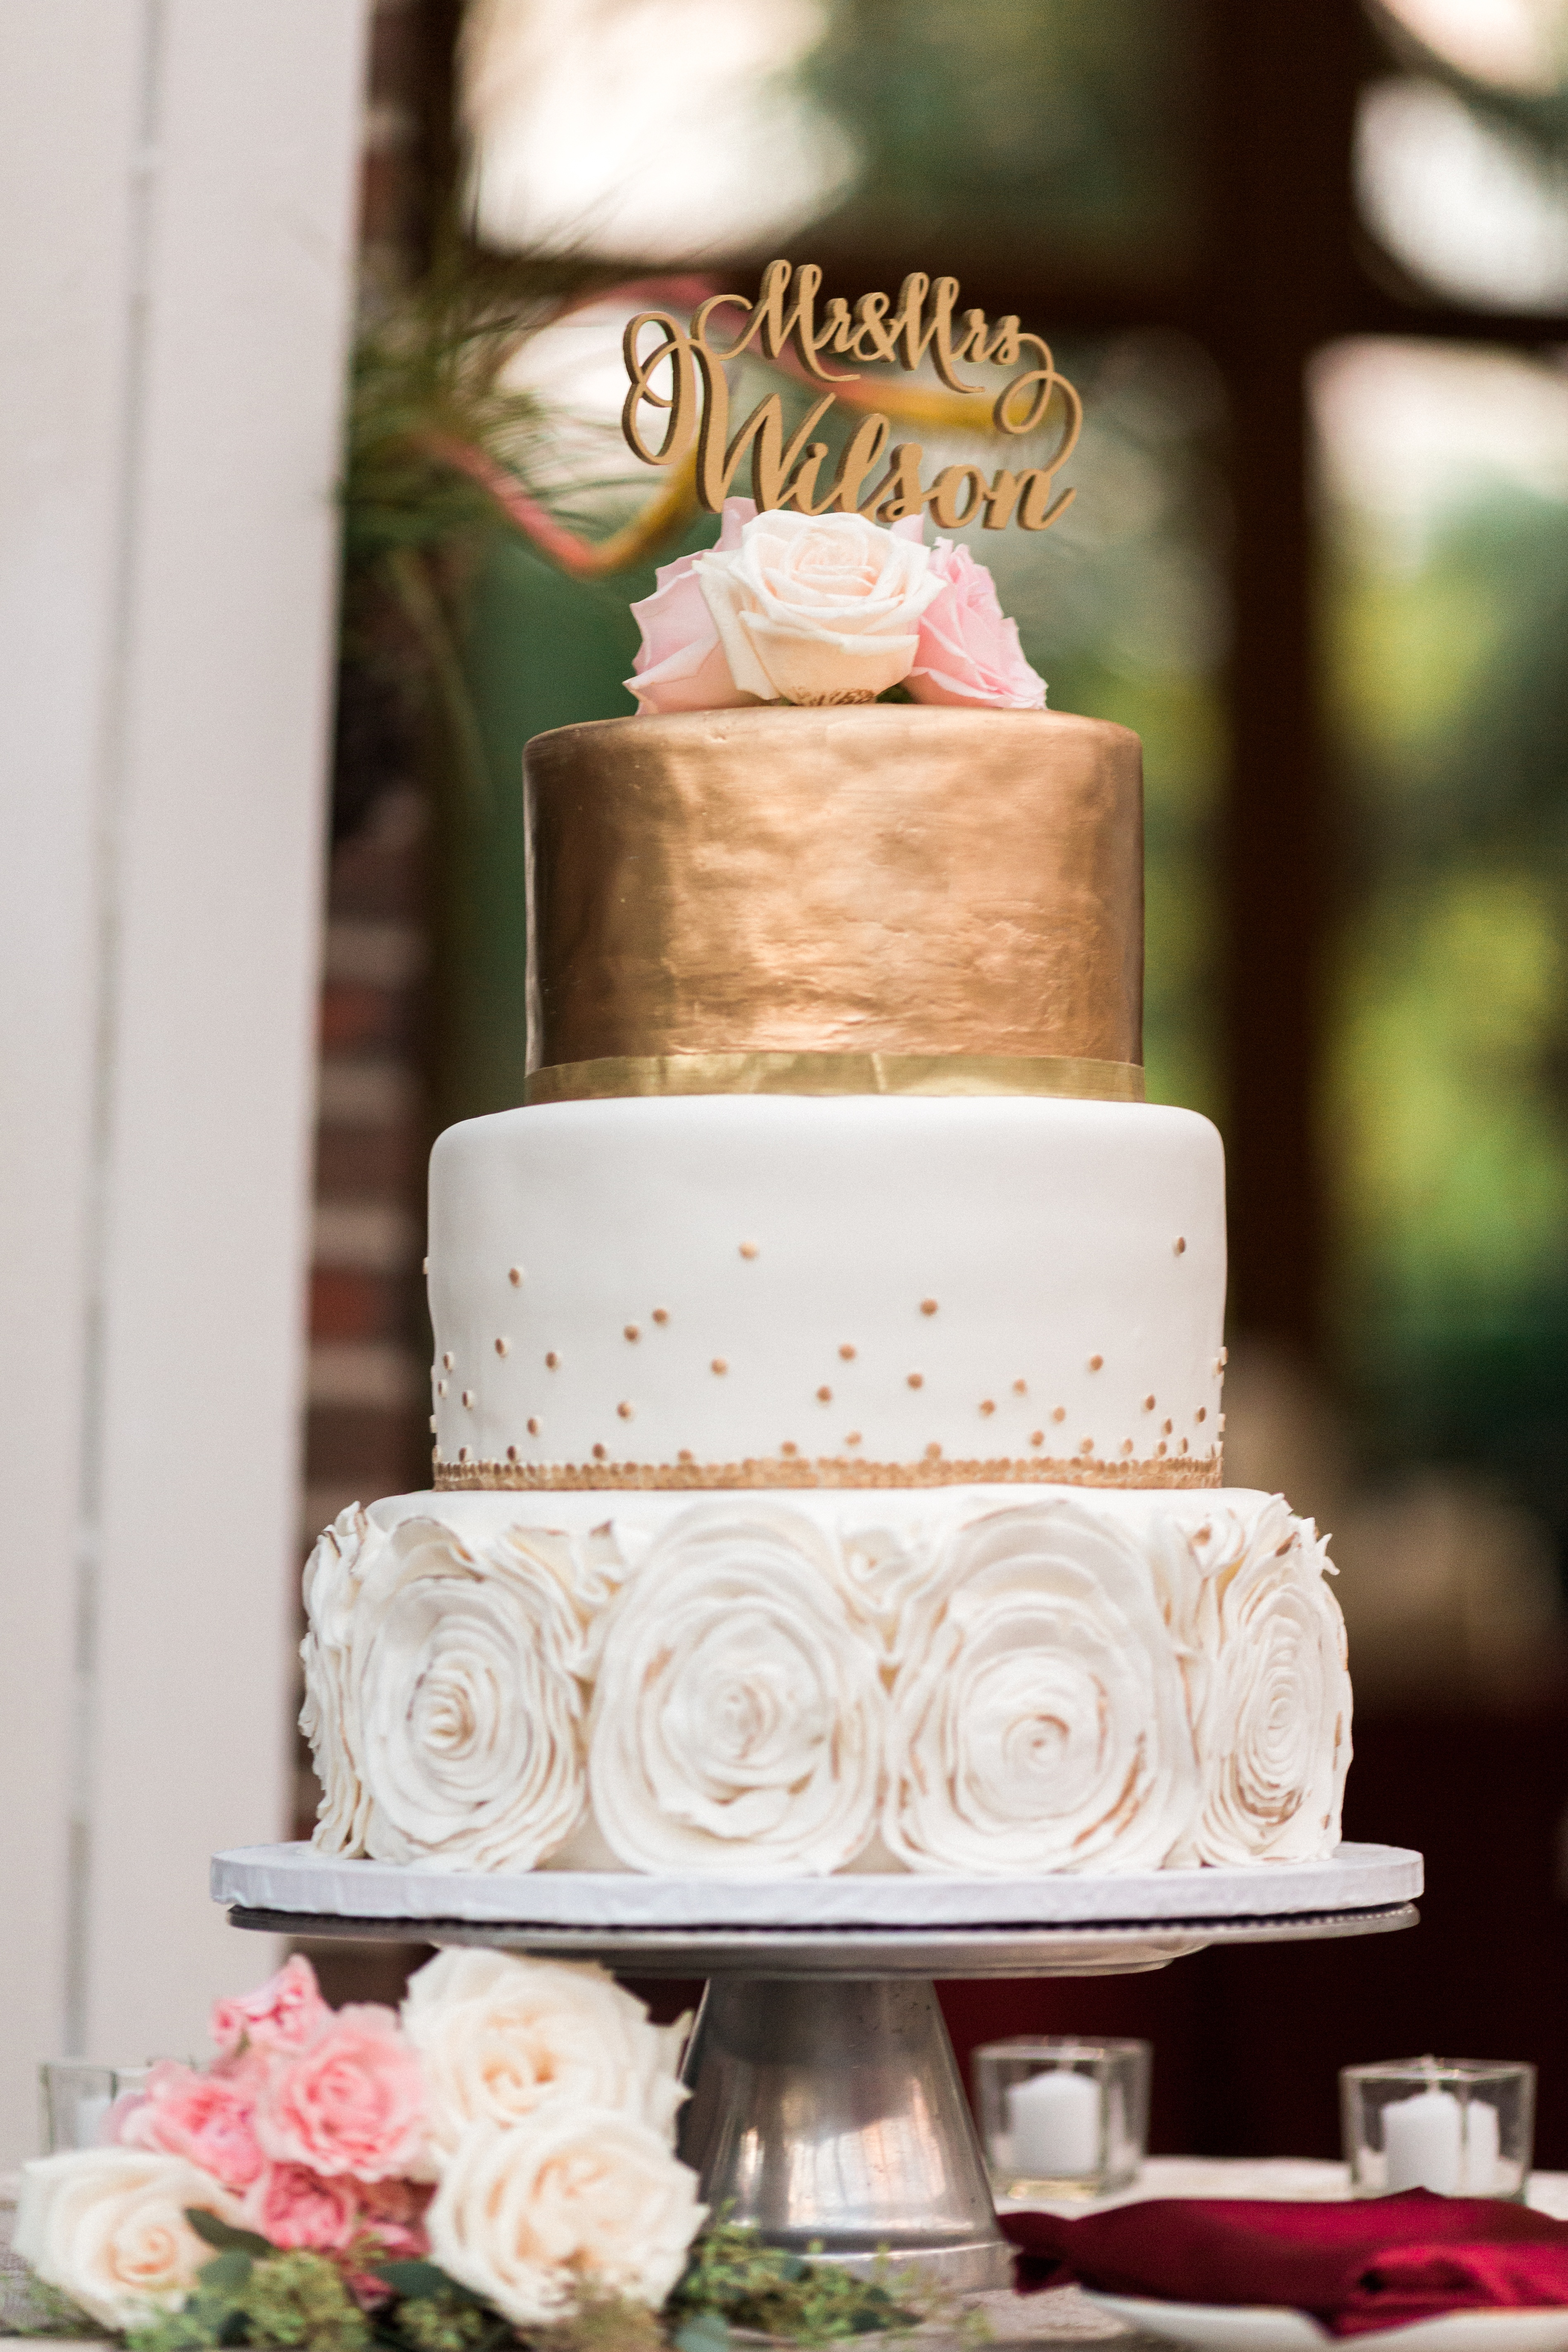 tower hill botanic garden wedding cake